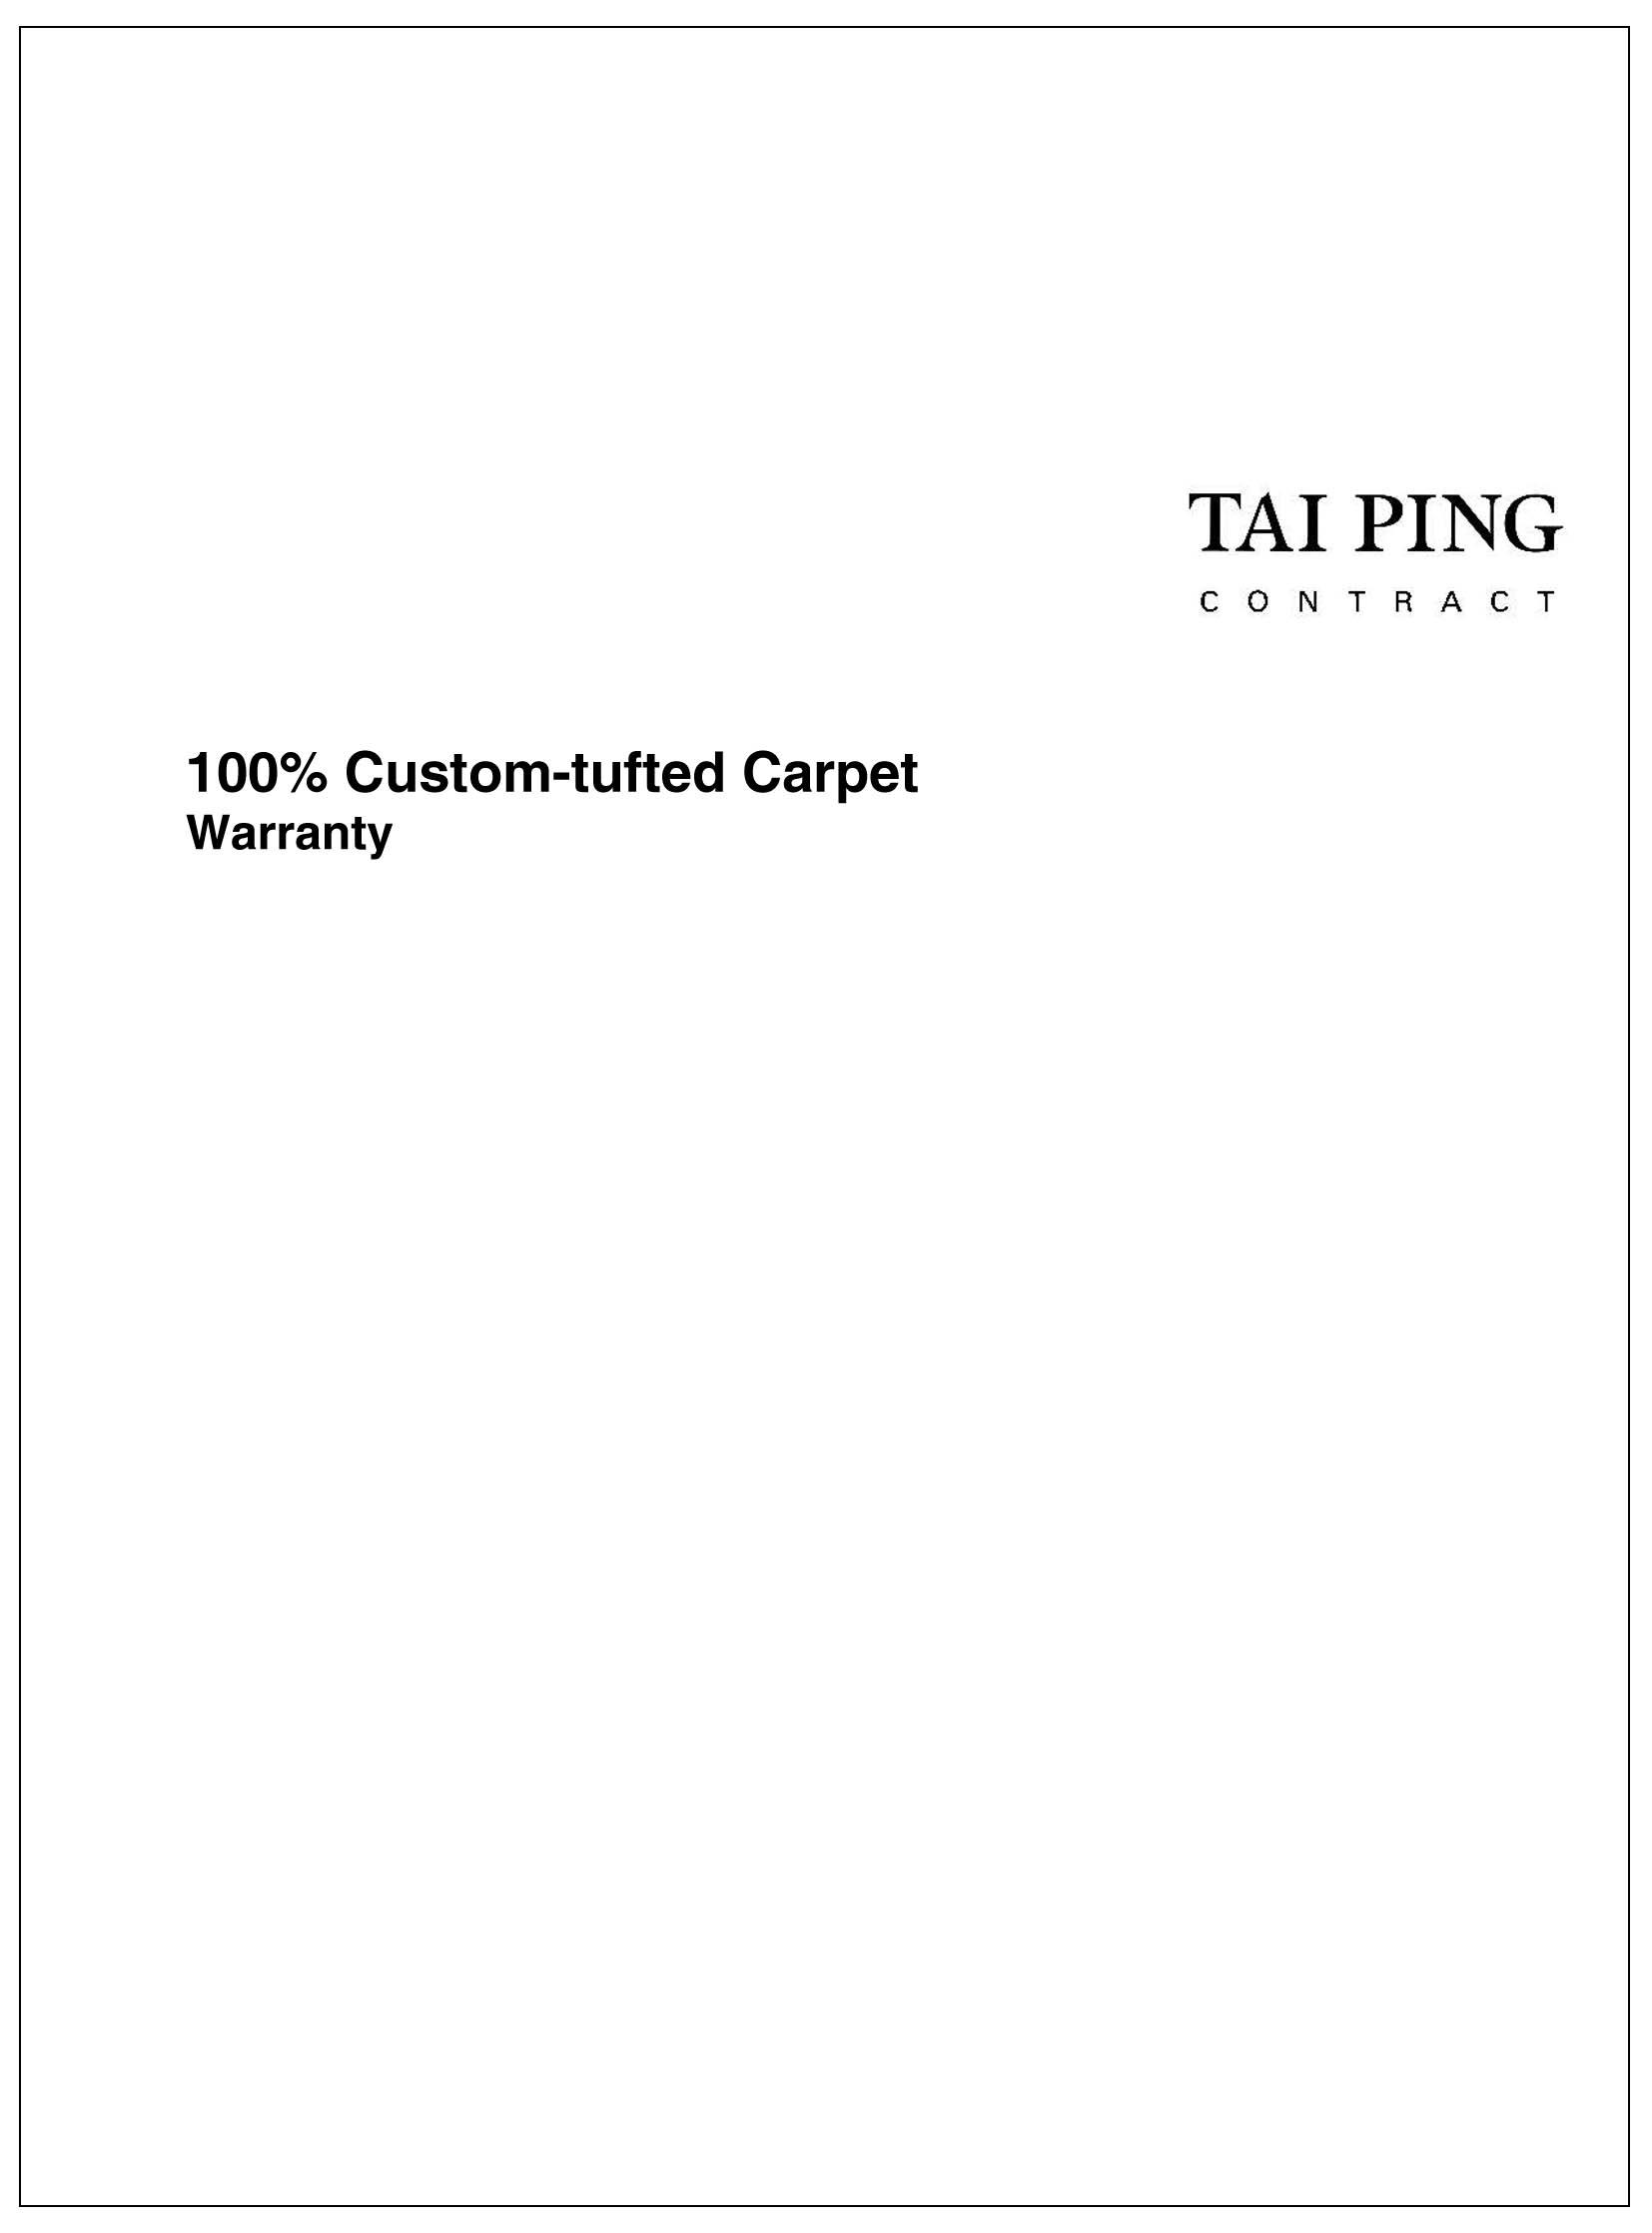 Custom-tufted Warranty